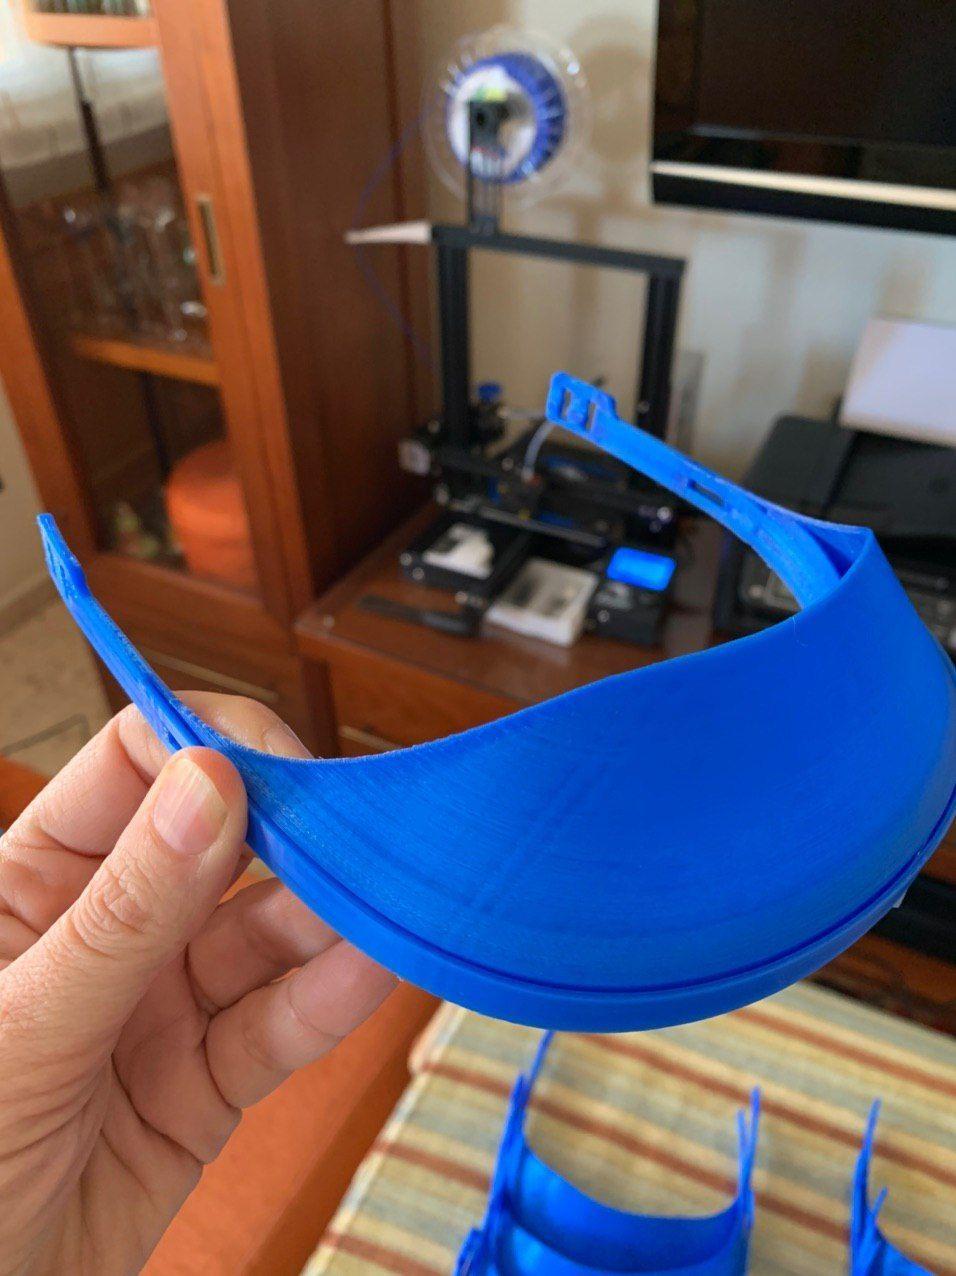 Alt Medizinische-3D-Masken-drucken, title Medizinische-3D-Masken-drucken